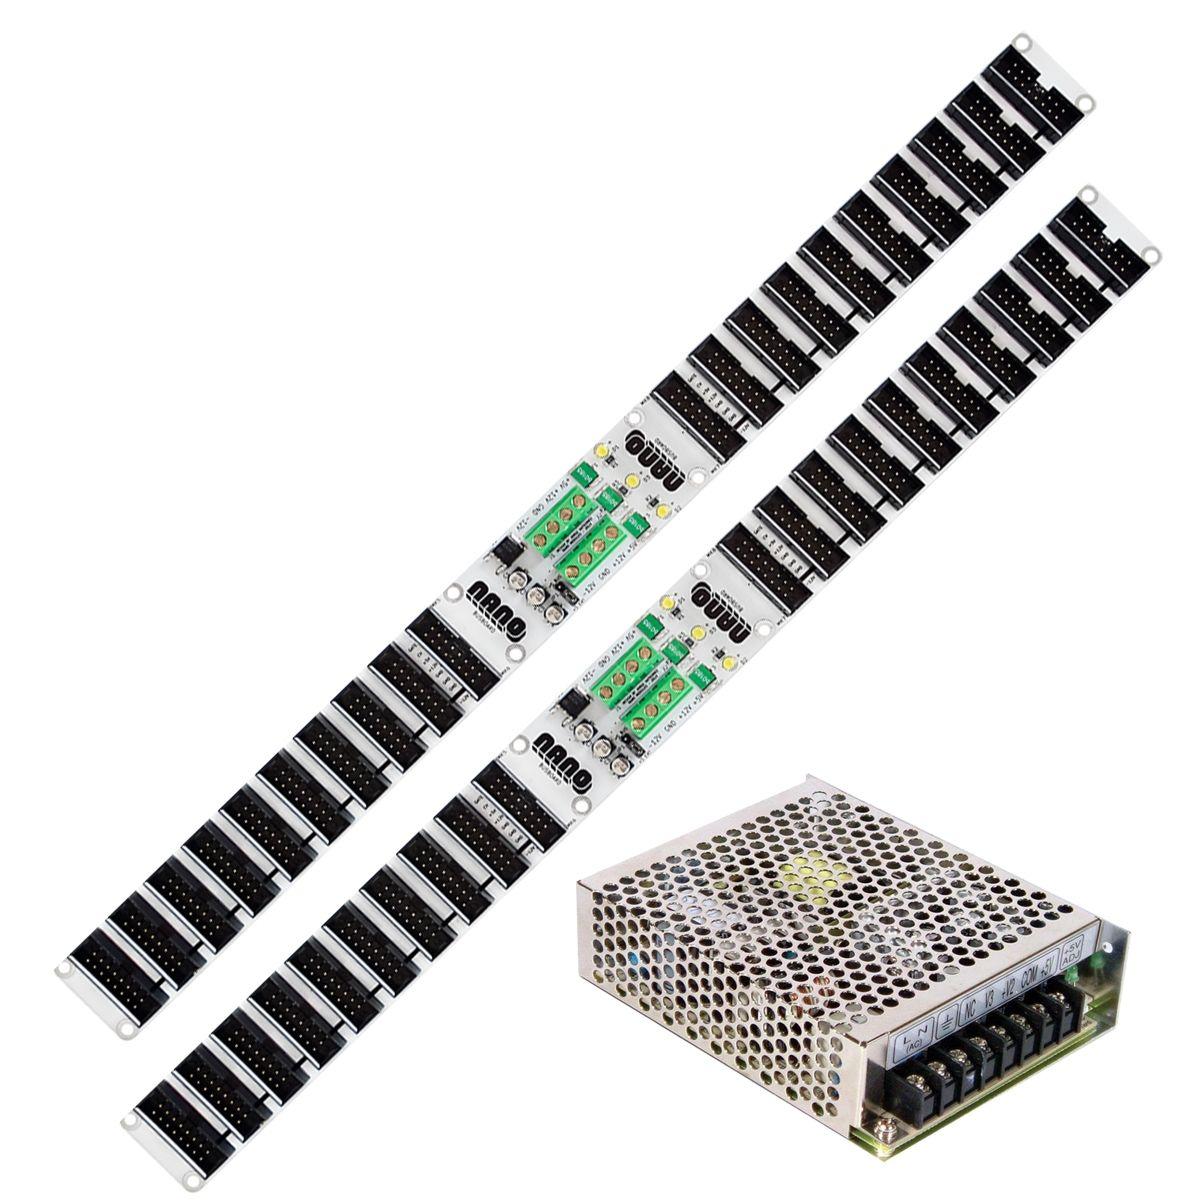 Nano Modules Eurorack Power Supply & 2 x Bus Board (DIY)